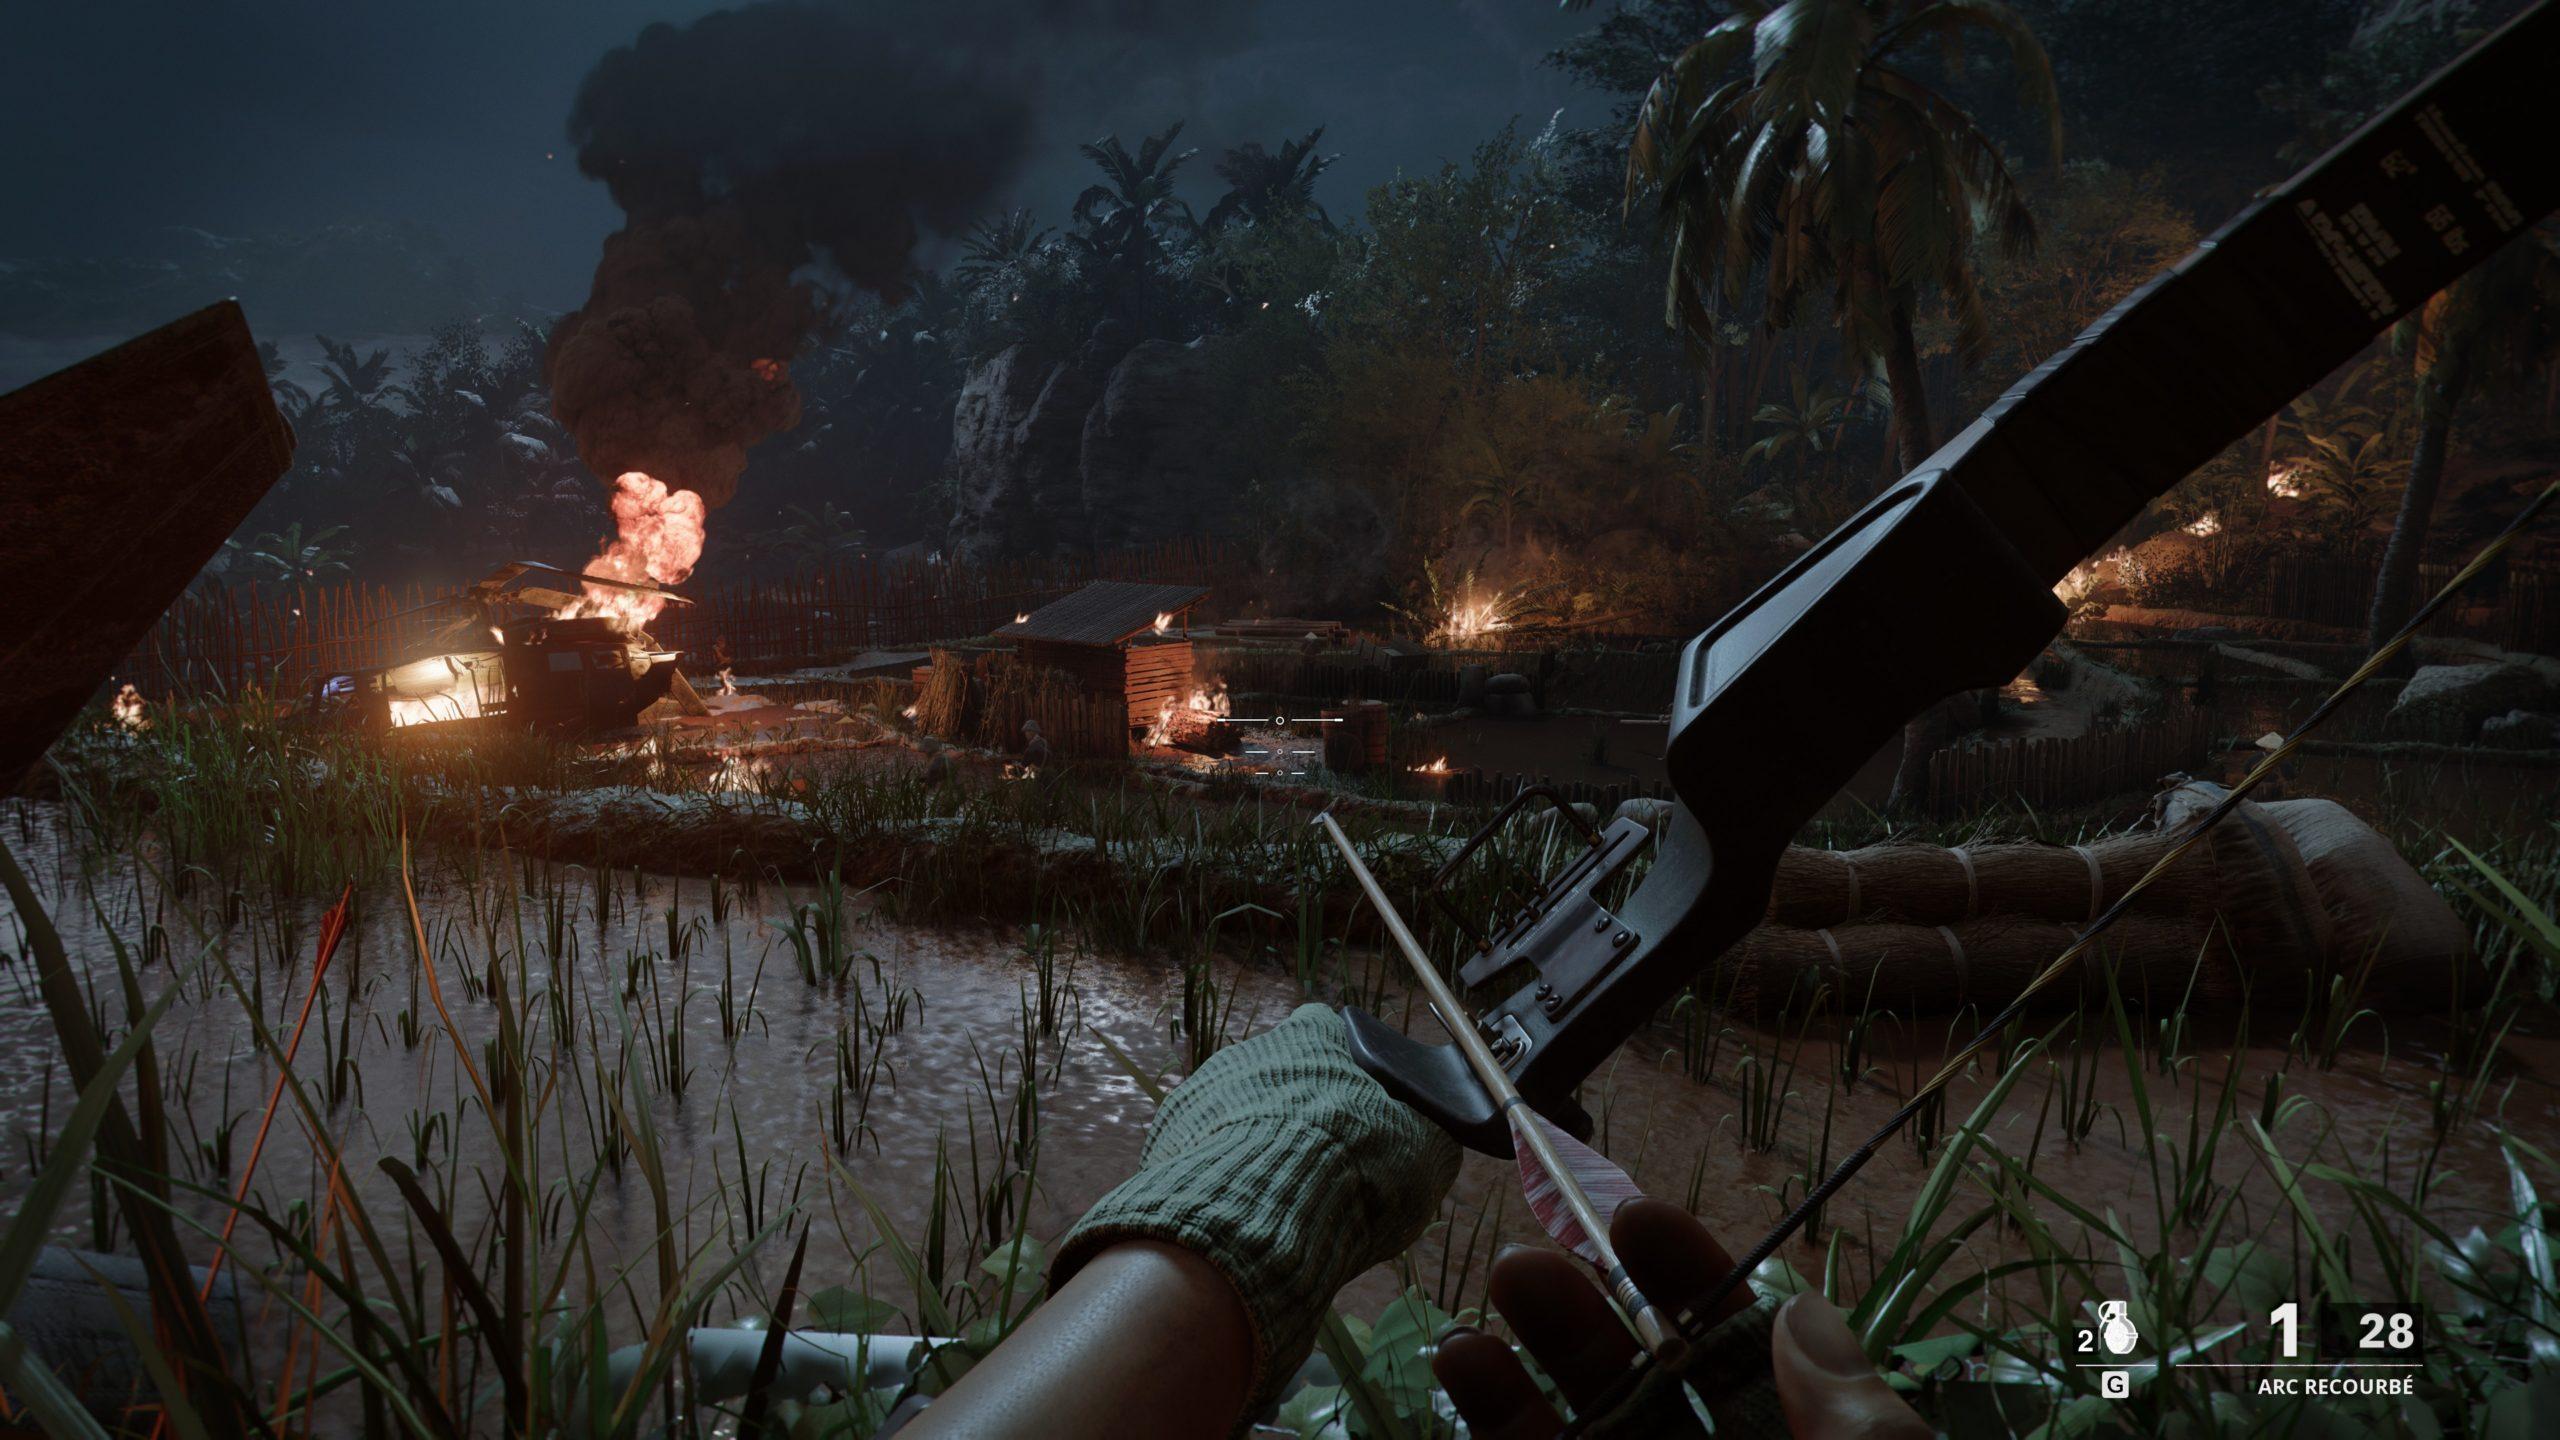 Test de jeu - Call of Duty : Black Ops Cold War